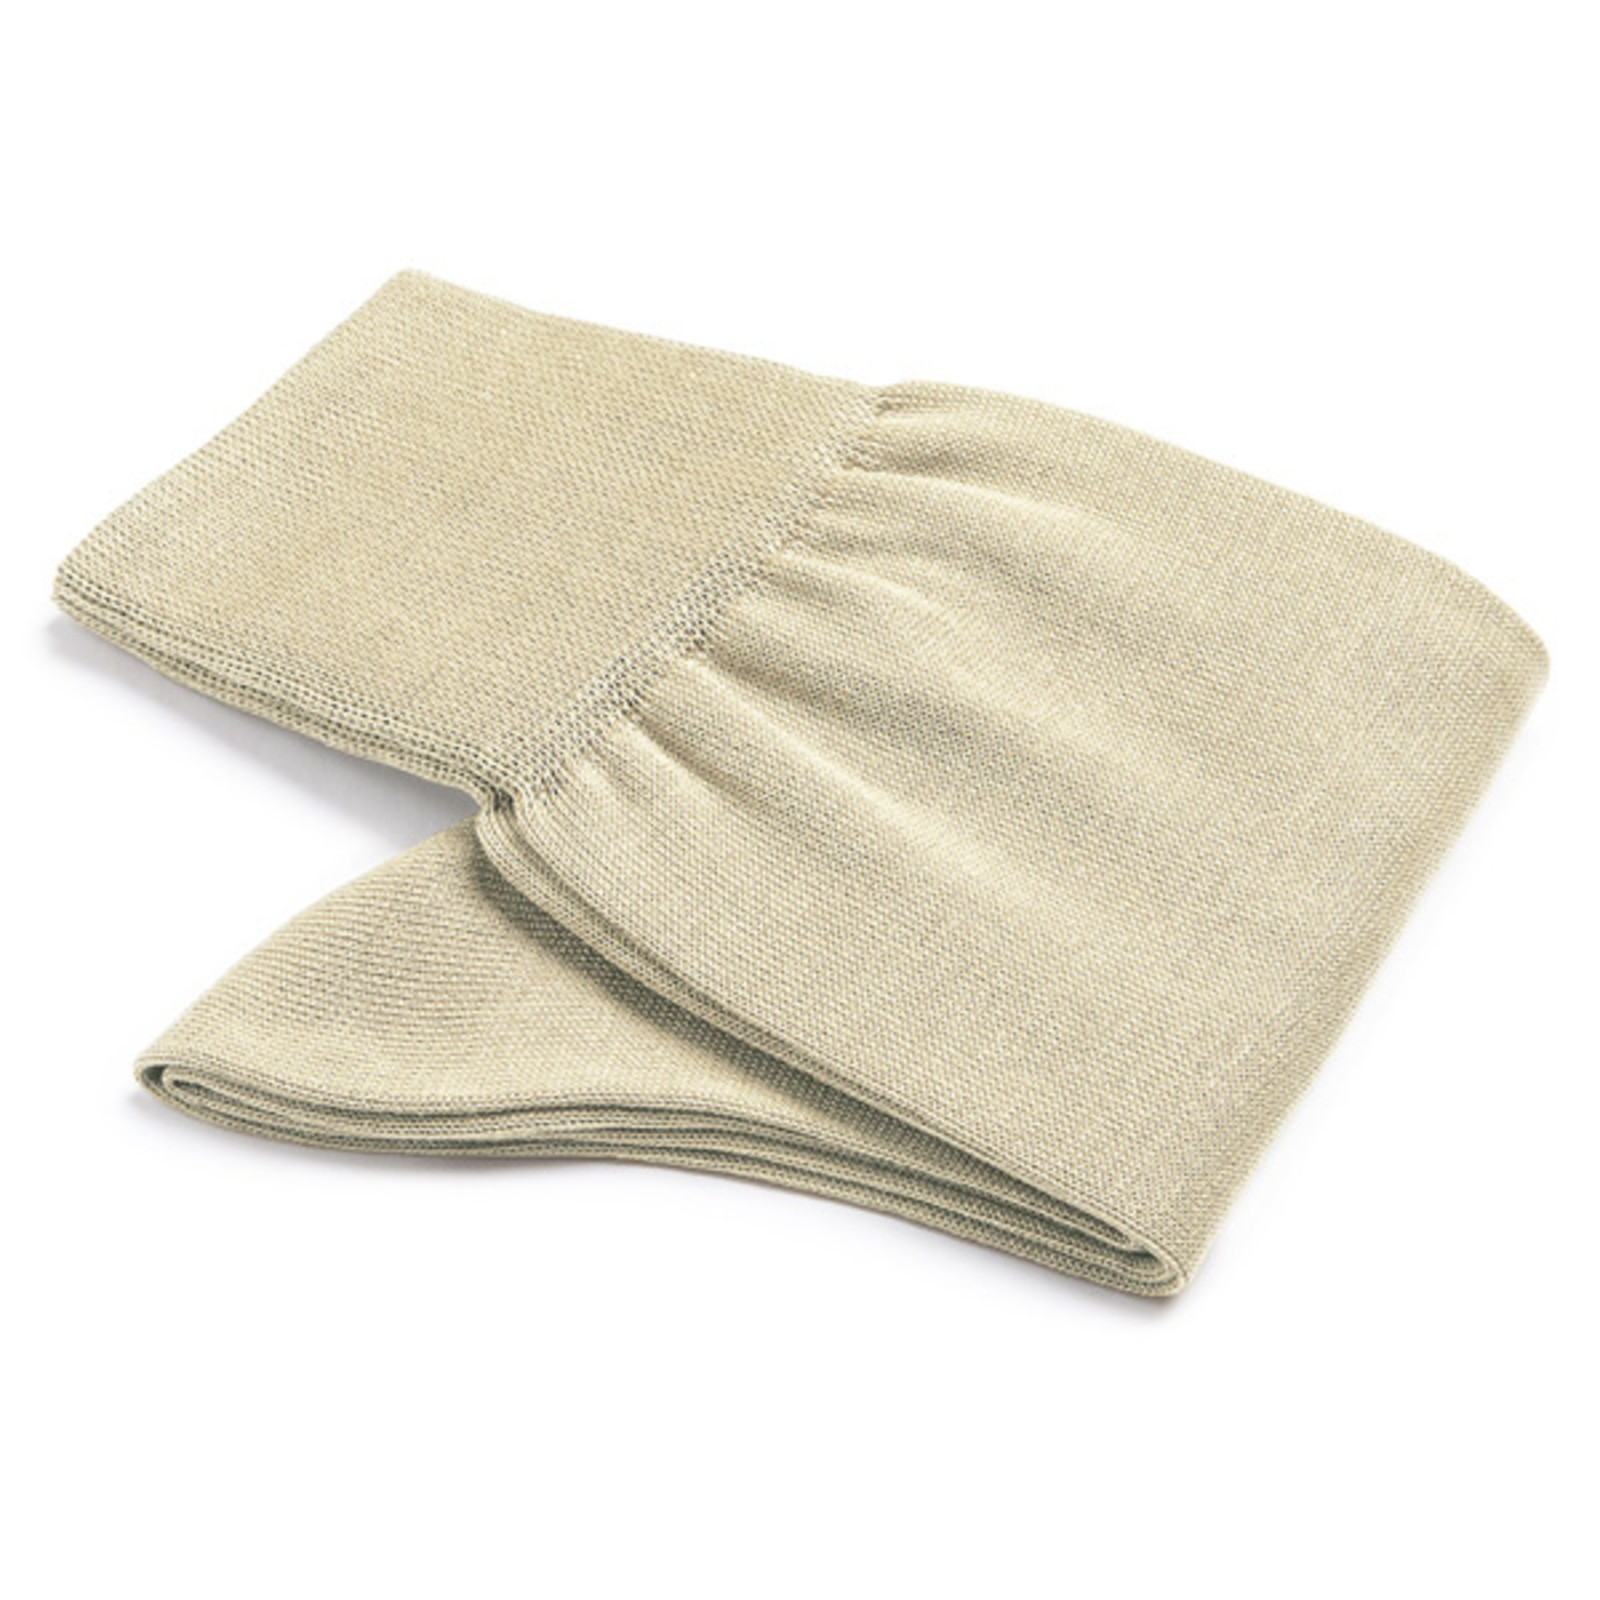 Carlo Lanza Beige socks cotton